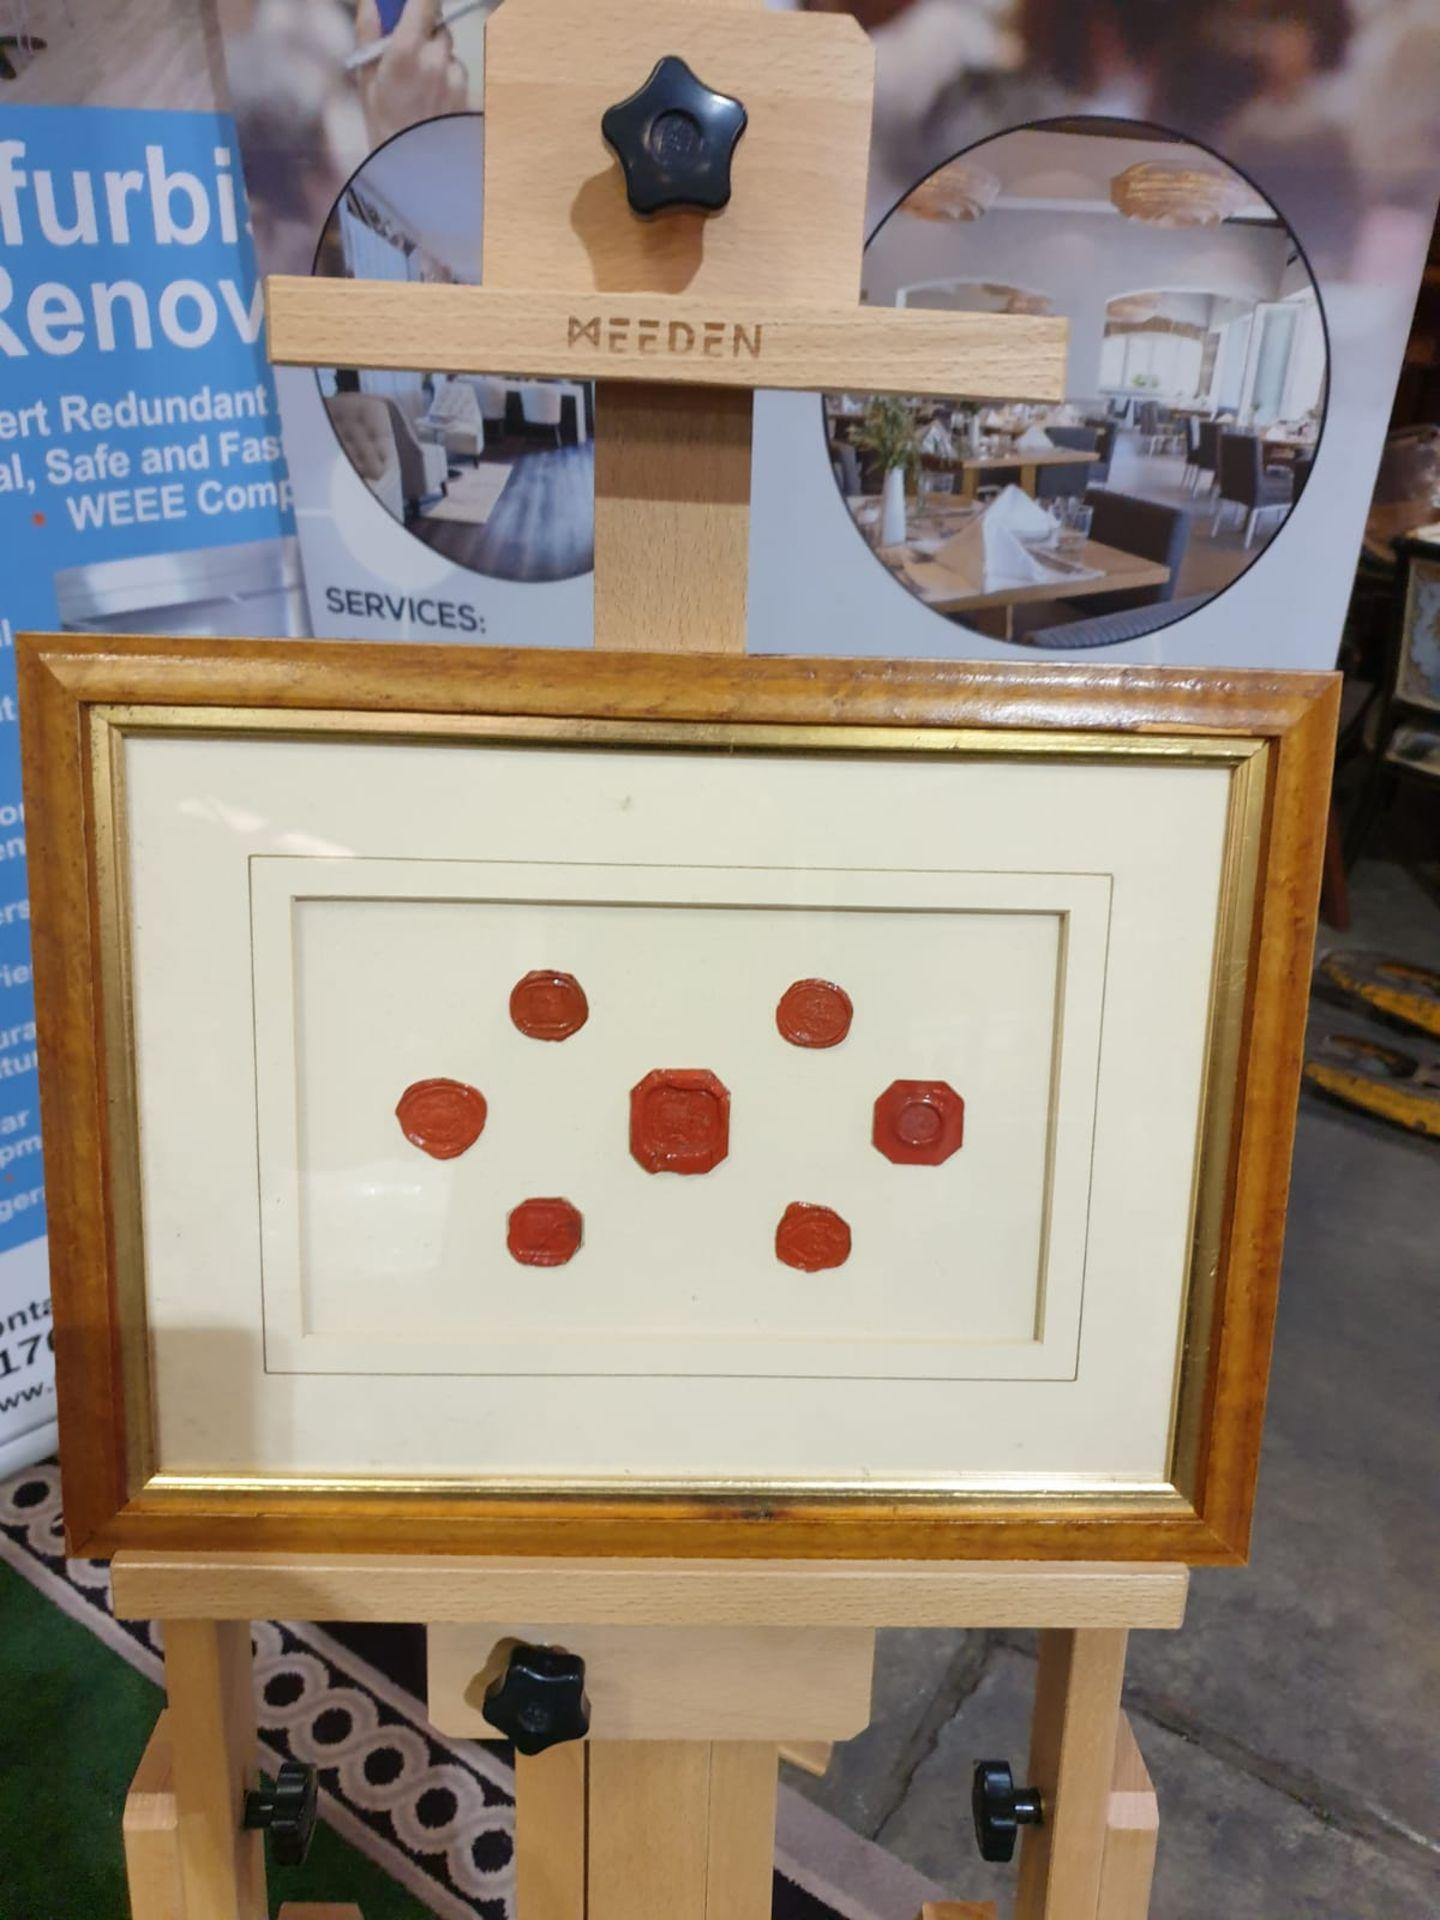 Framed artwork of wax Seals in Wood frame 42 x 32cm - Image 3 of 4